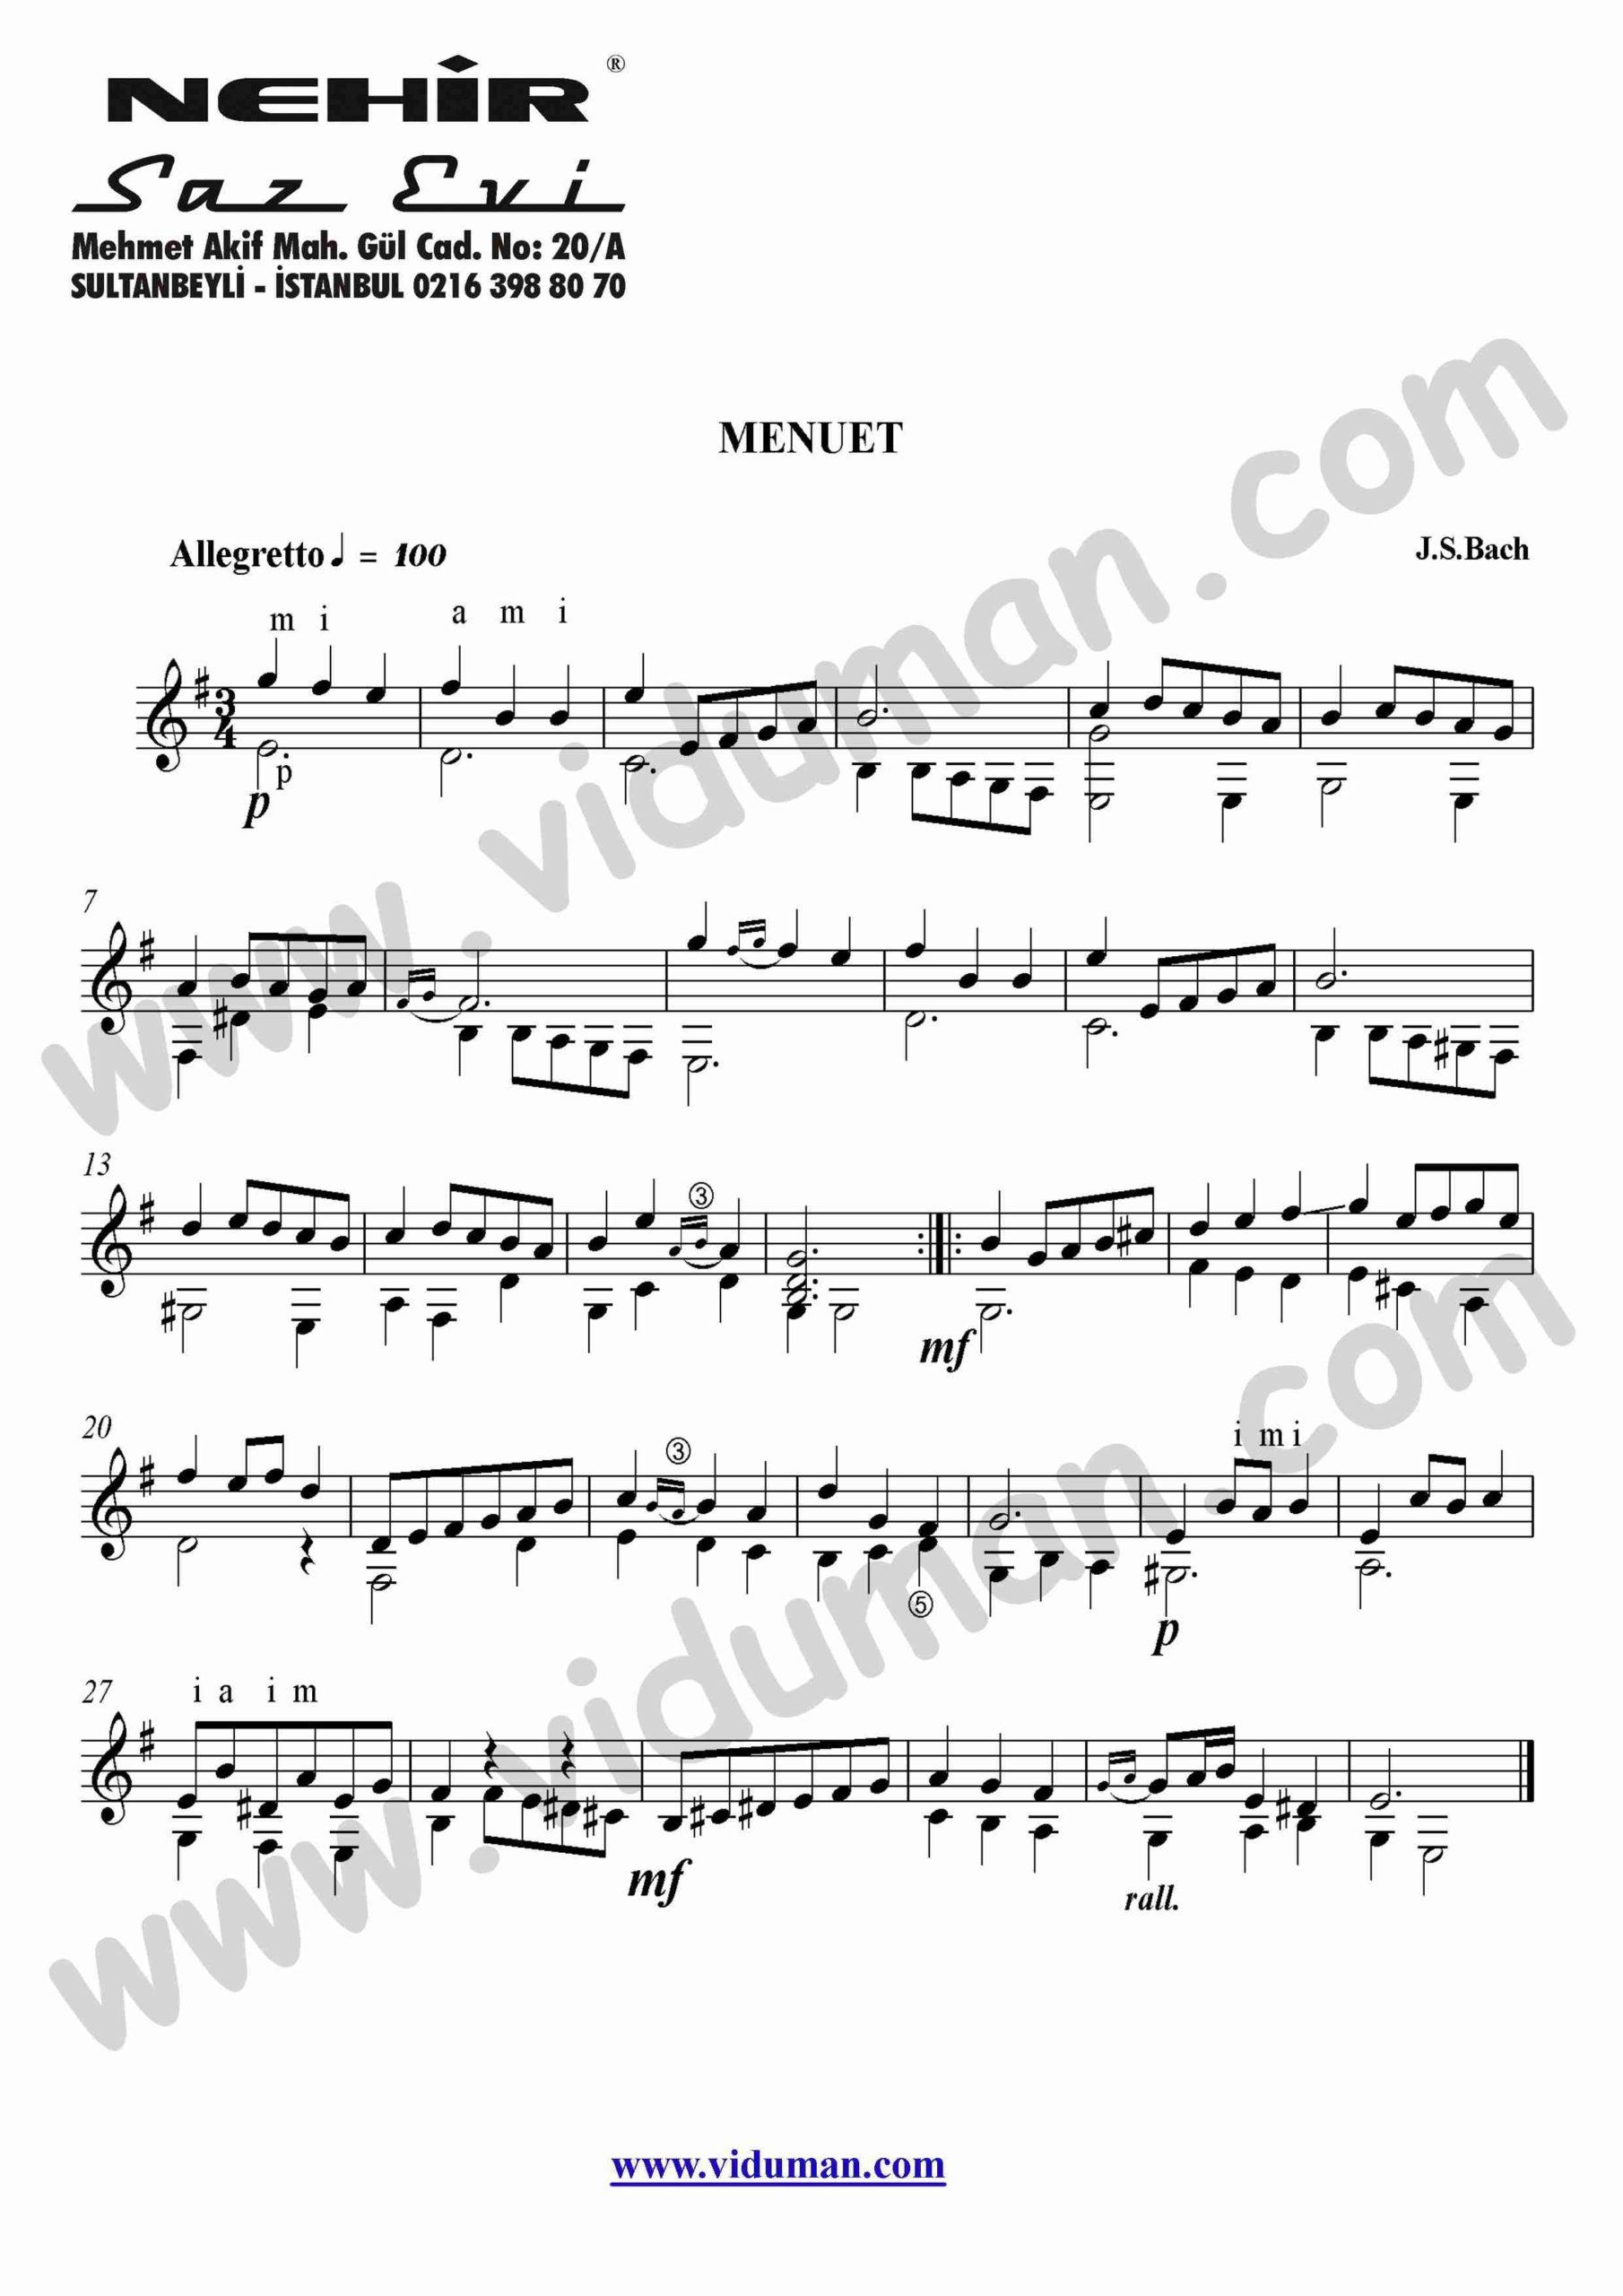 77- Menuet (J.S.Bach)